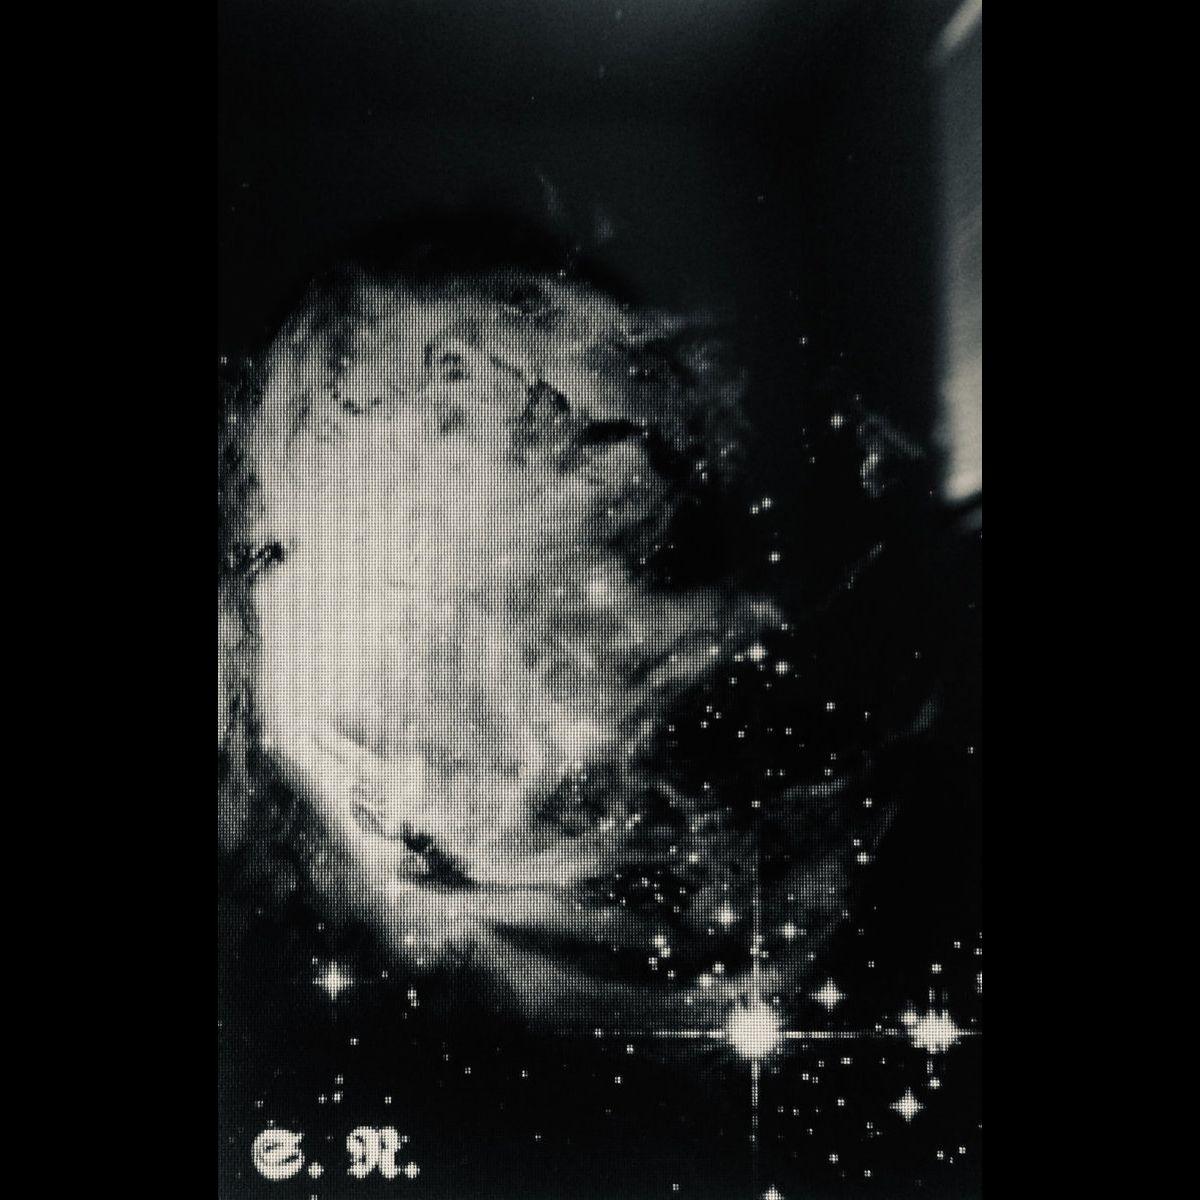 Starcave Nebula - And Tomorrow, the Stars...